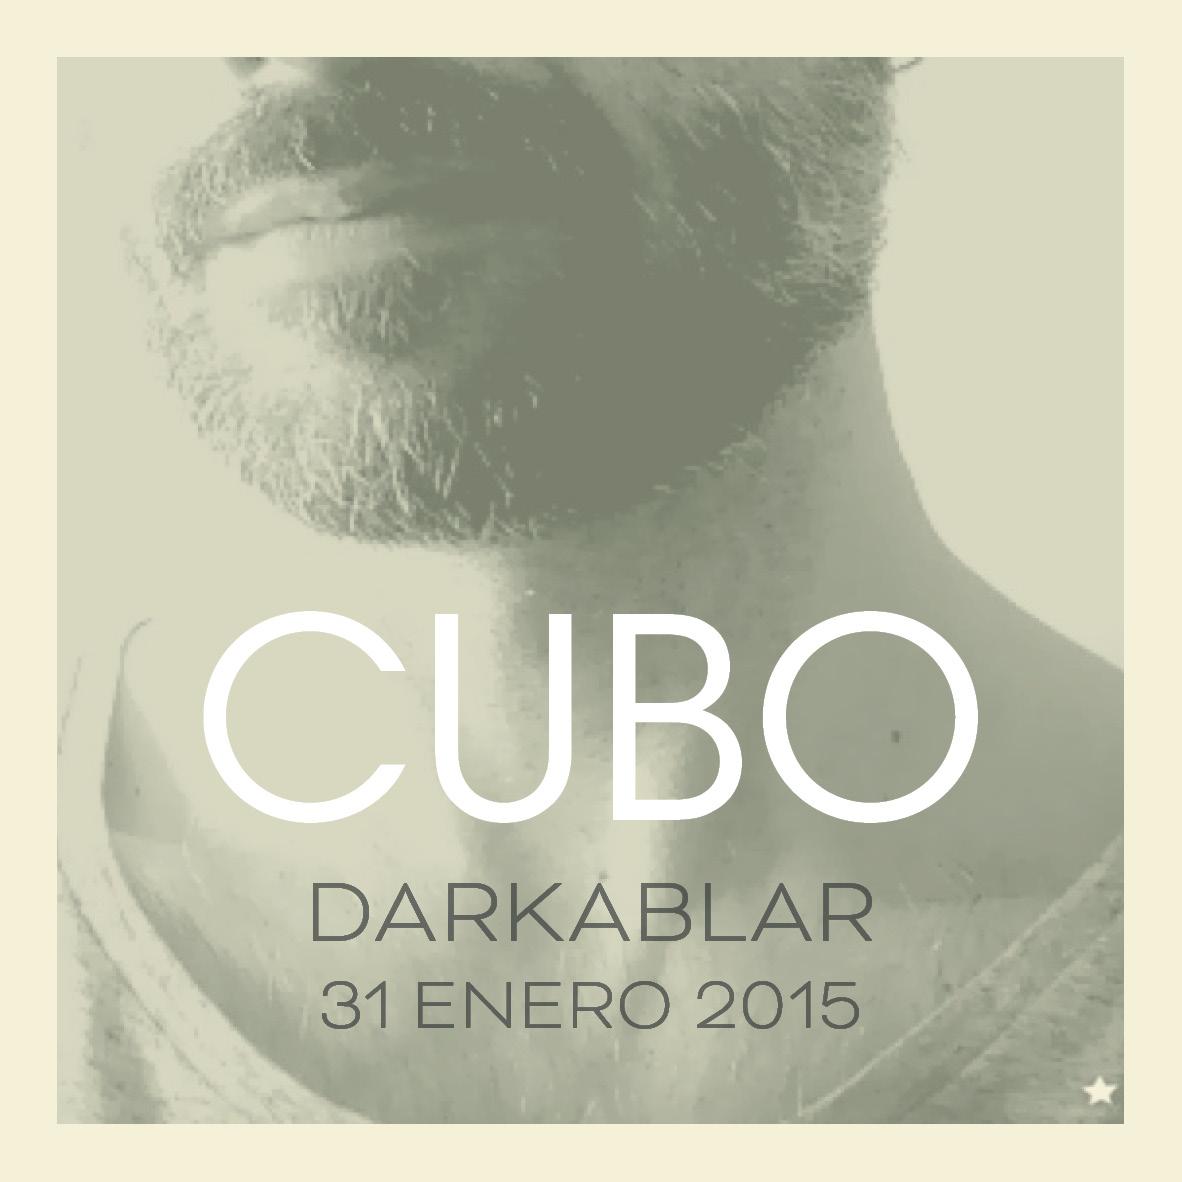 cubo_darkablar_31enero2015